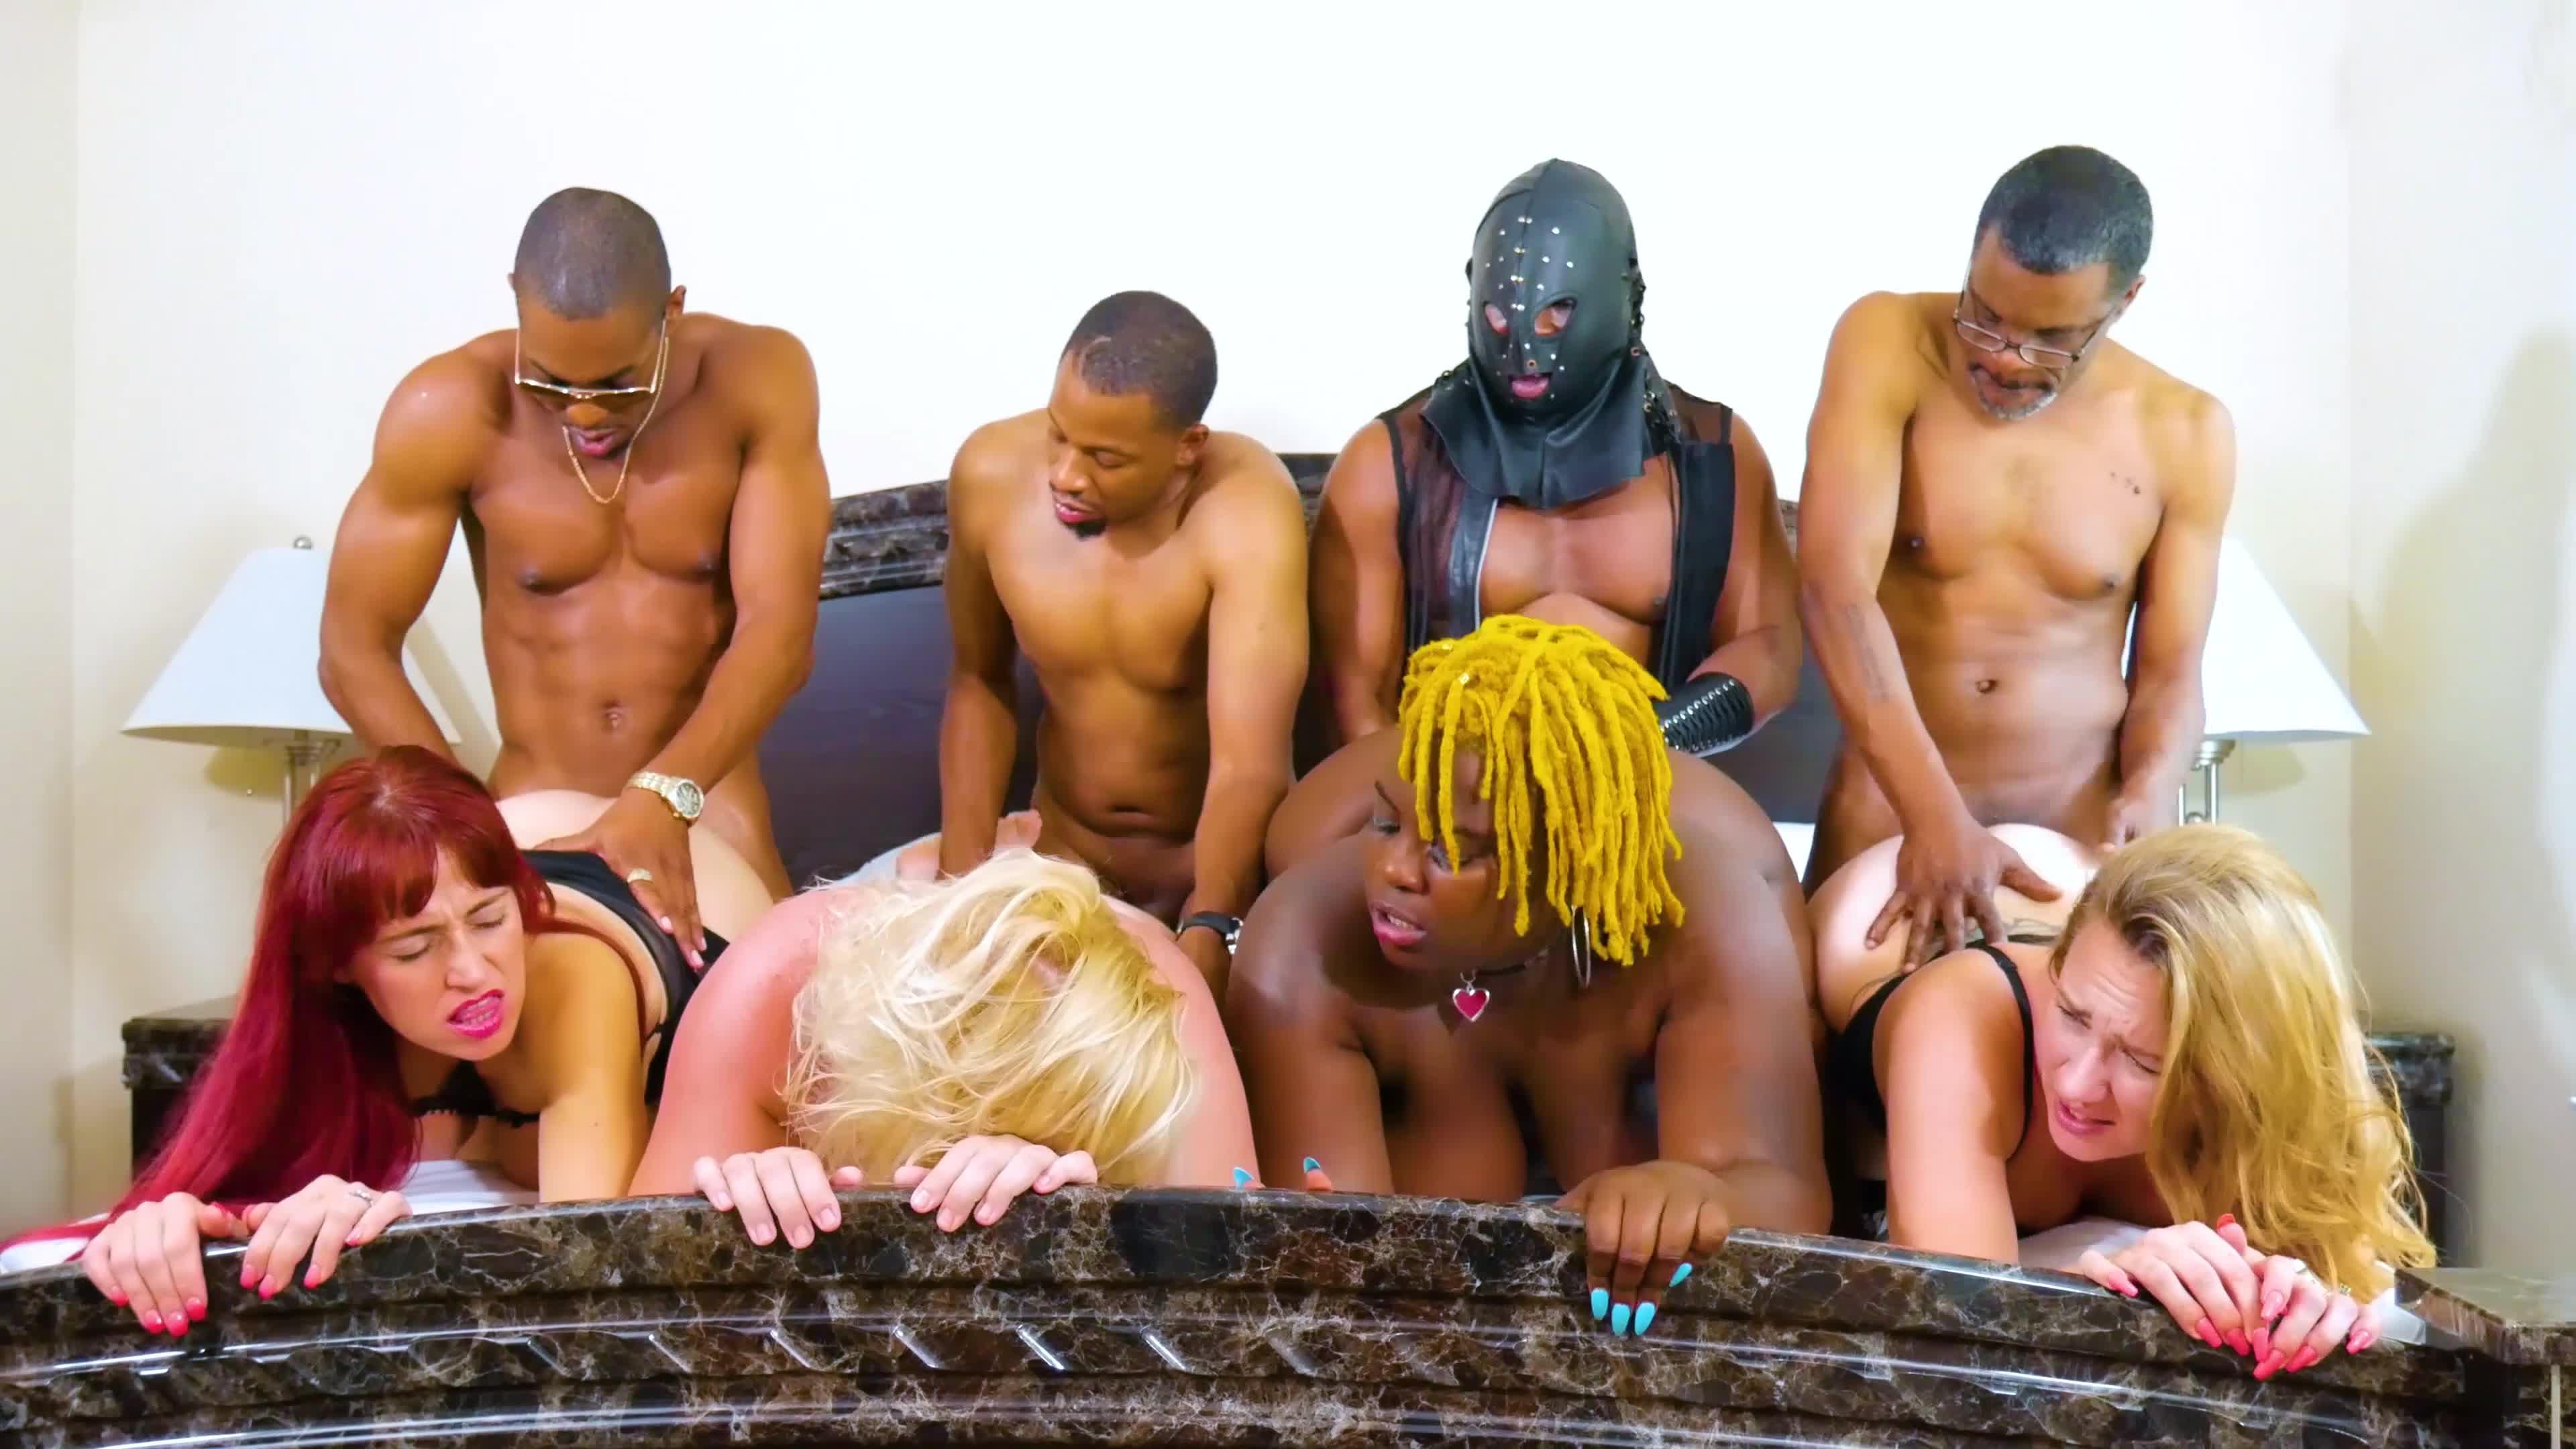 Black married orgy jesse jane naked